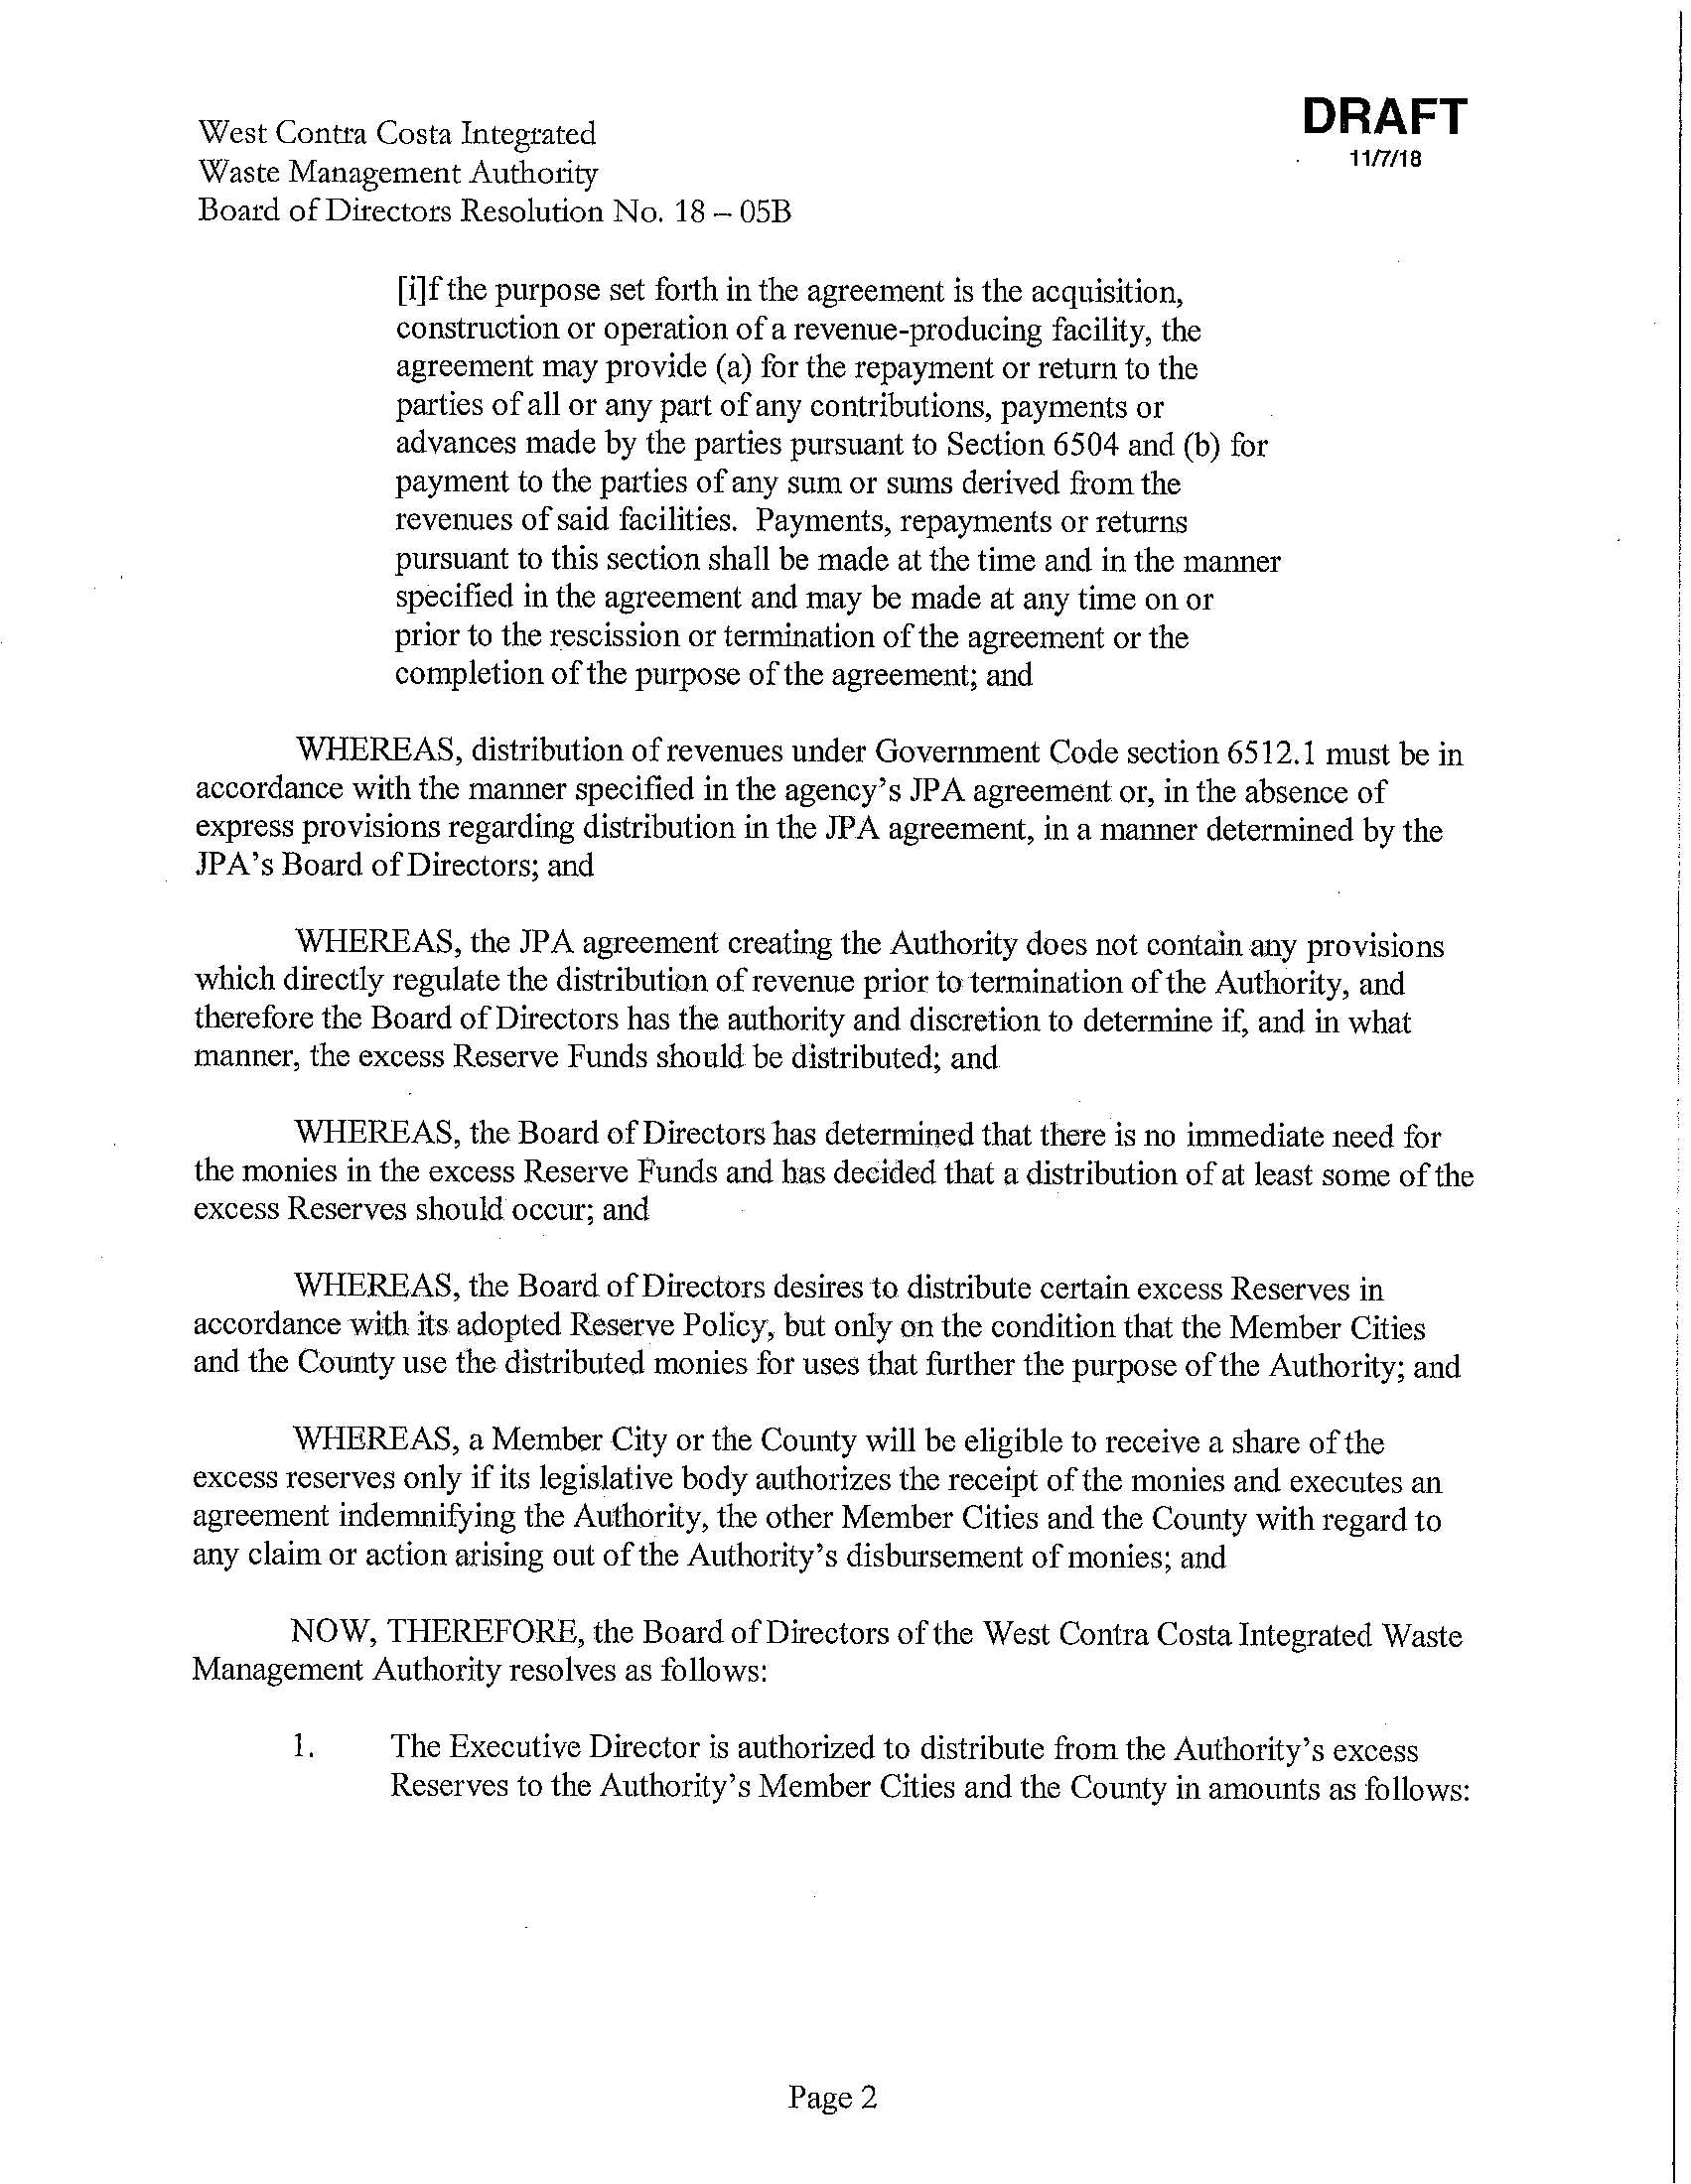 ESMAC Agenda 11.14.2018 (46 Pages)_23.jpg